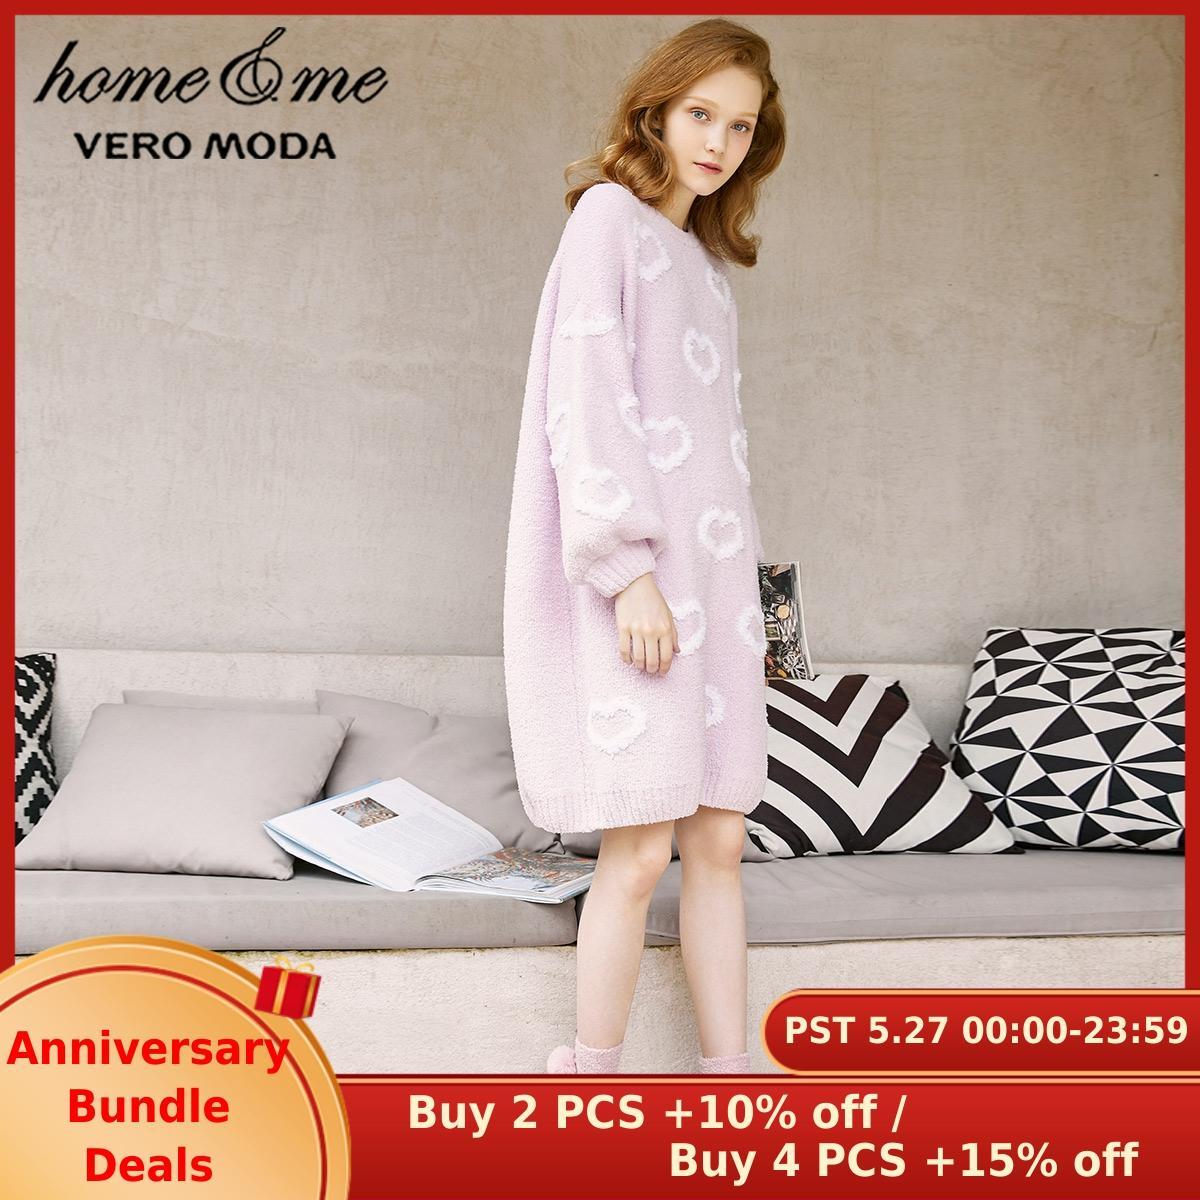 Vero Moda New Women's Heart-shaped Balloon Sleeves Sleepwear Dress | 319446545